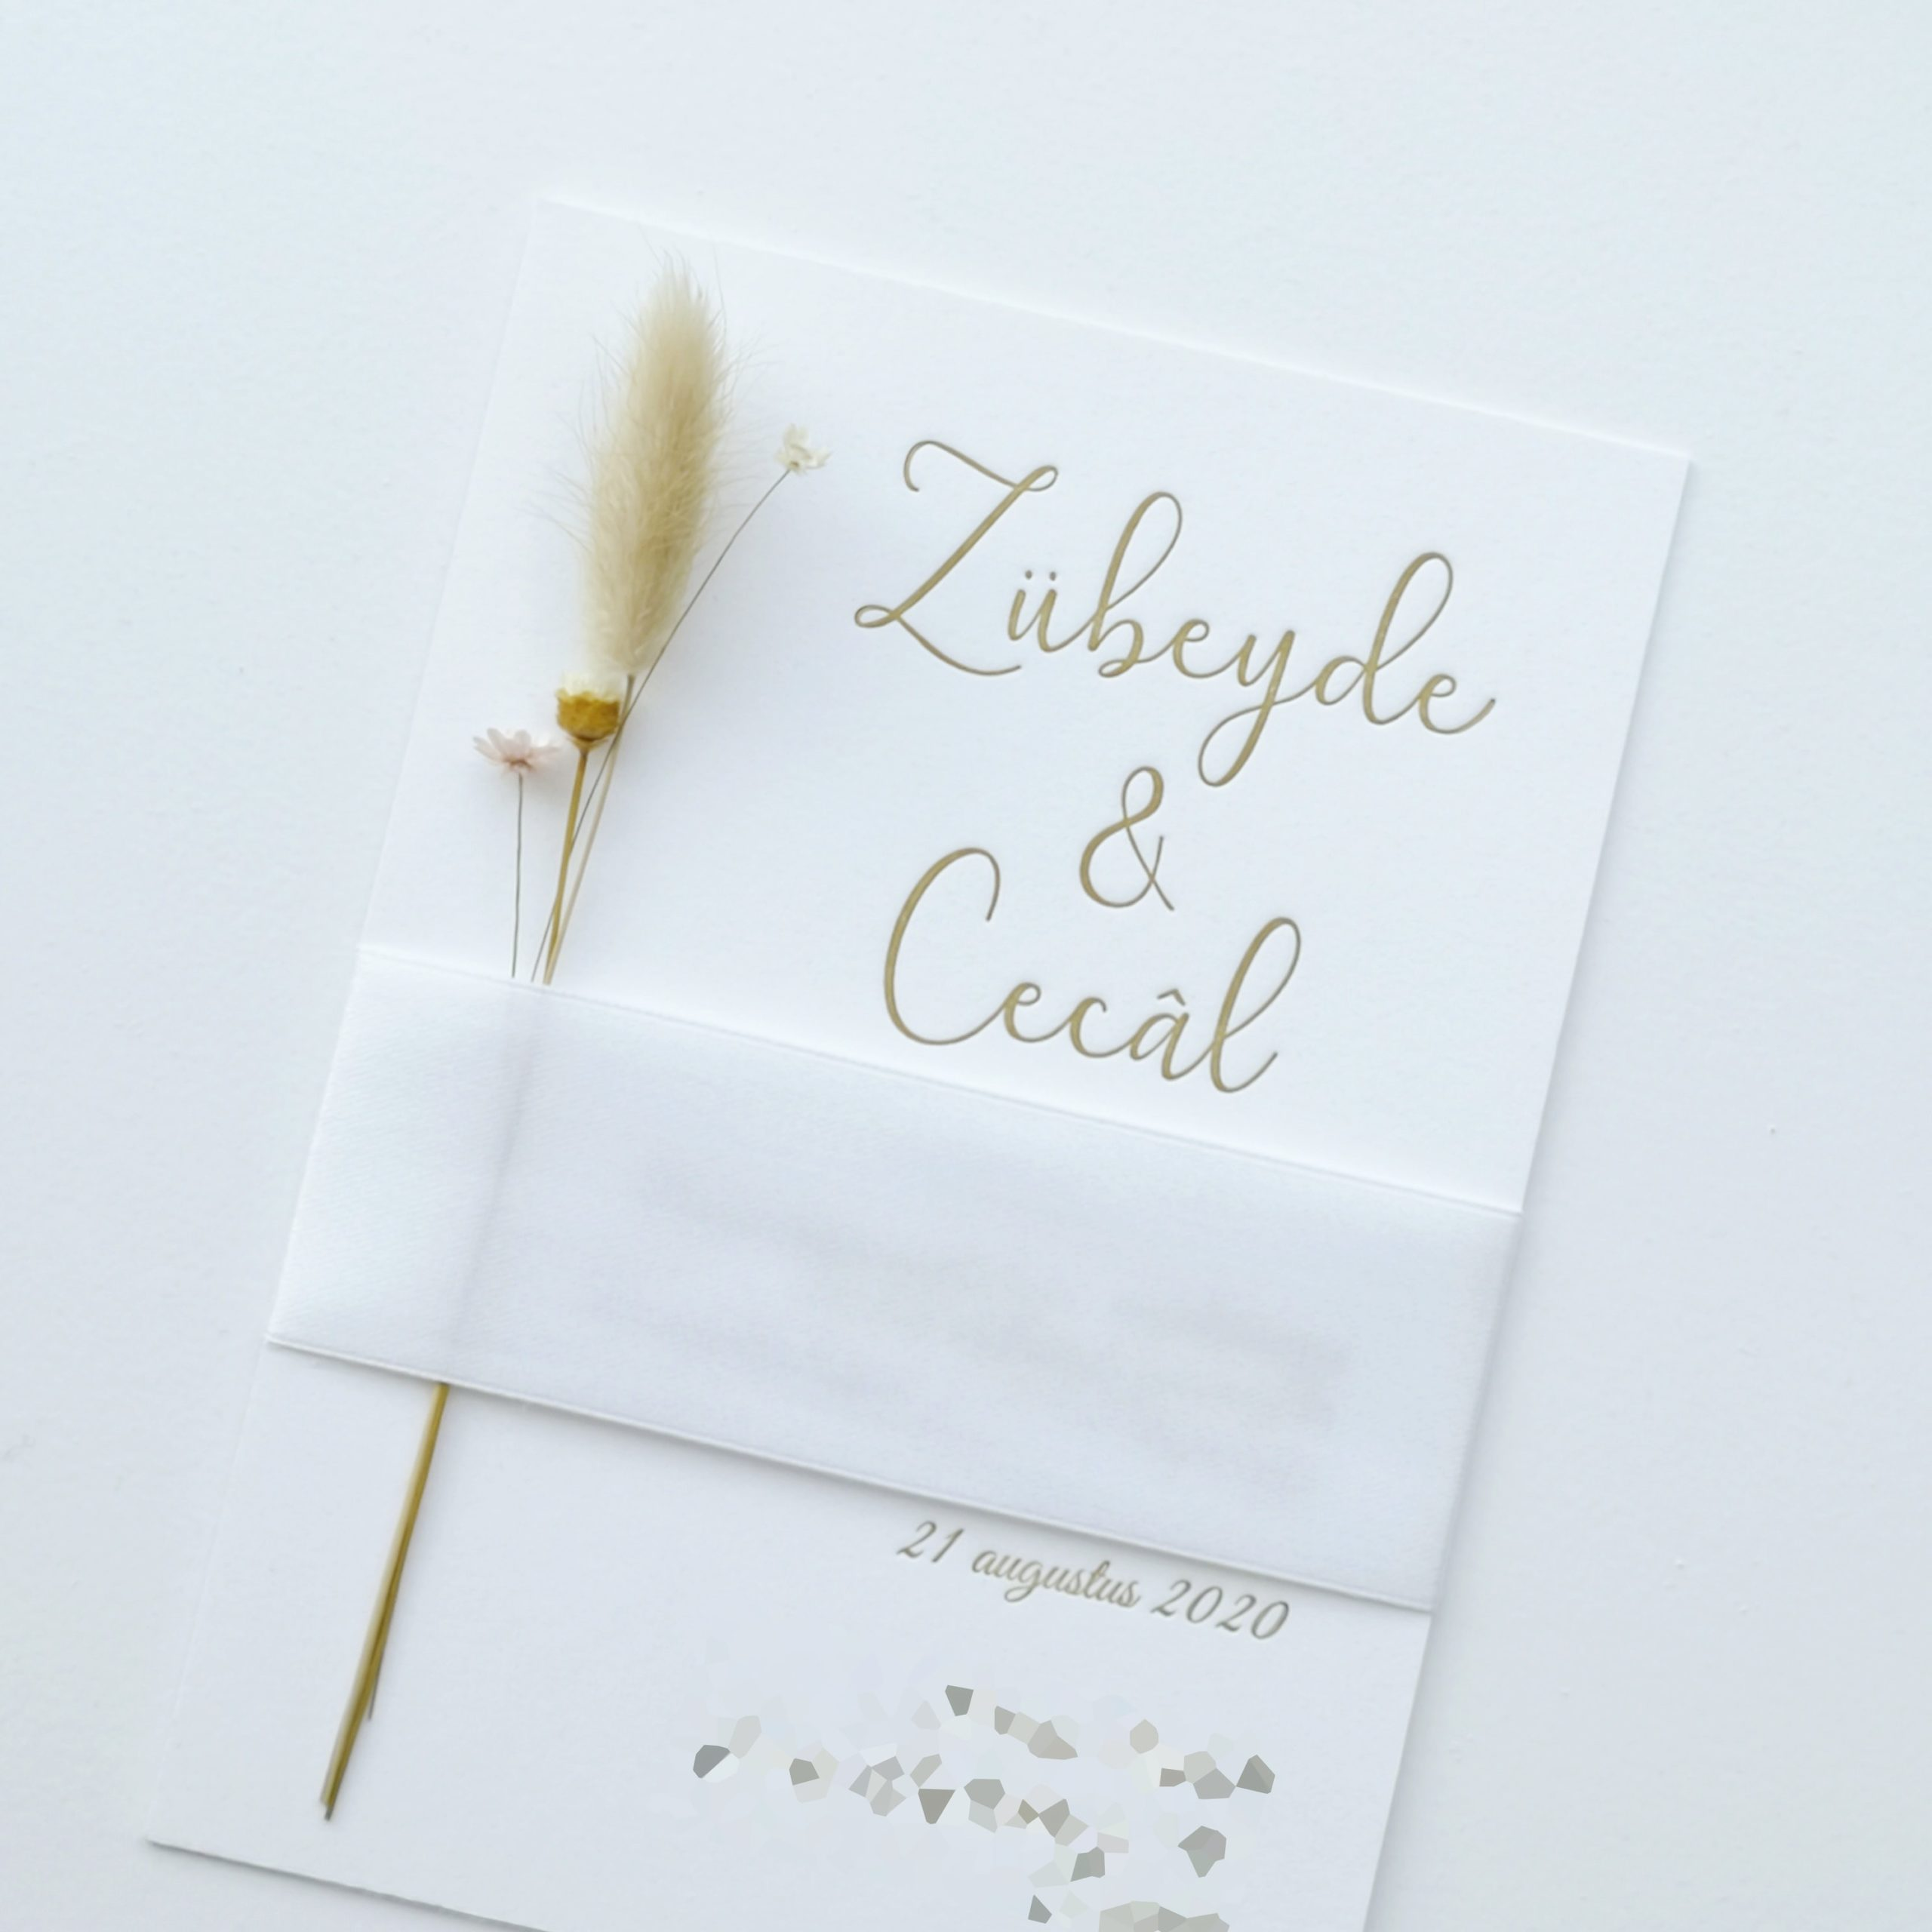 Letterpress Trouwkaart met Lint en Droogbloemen